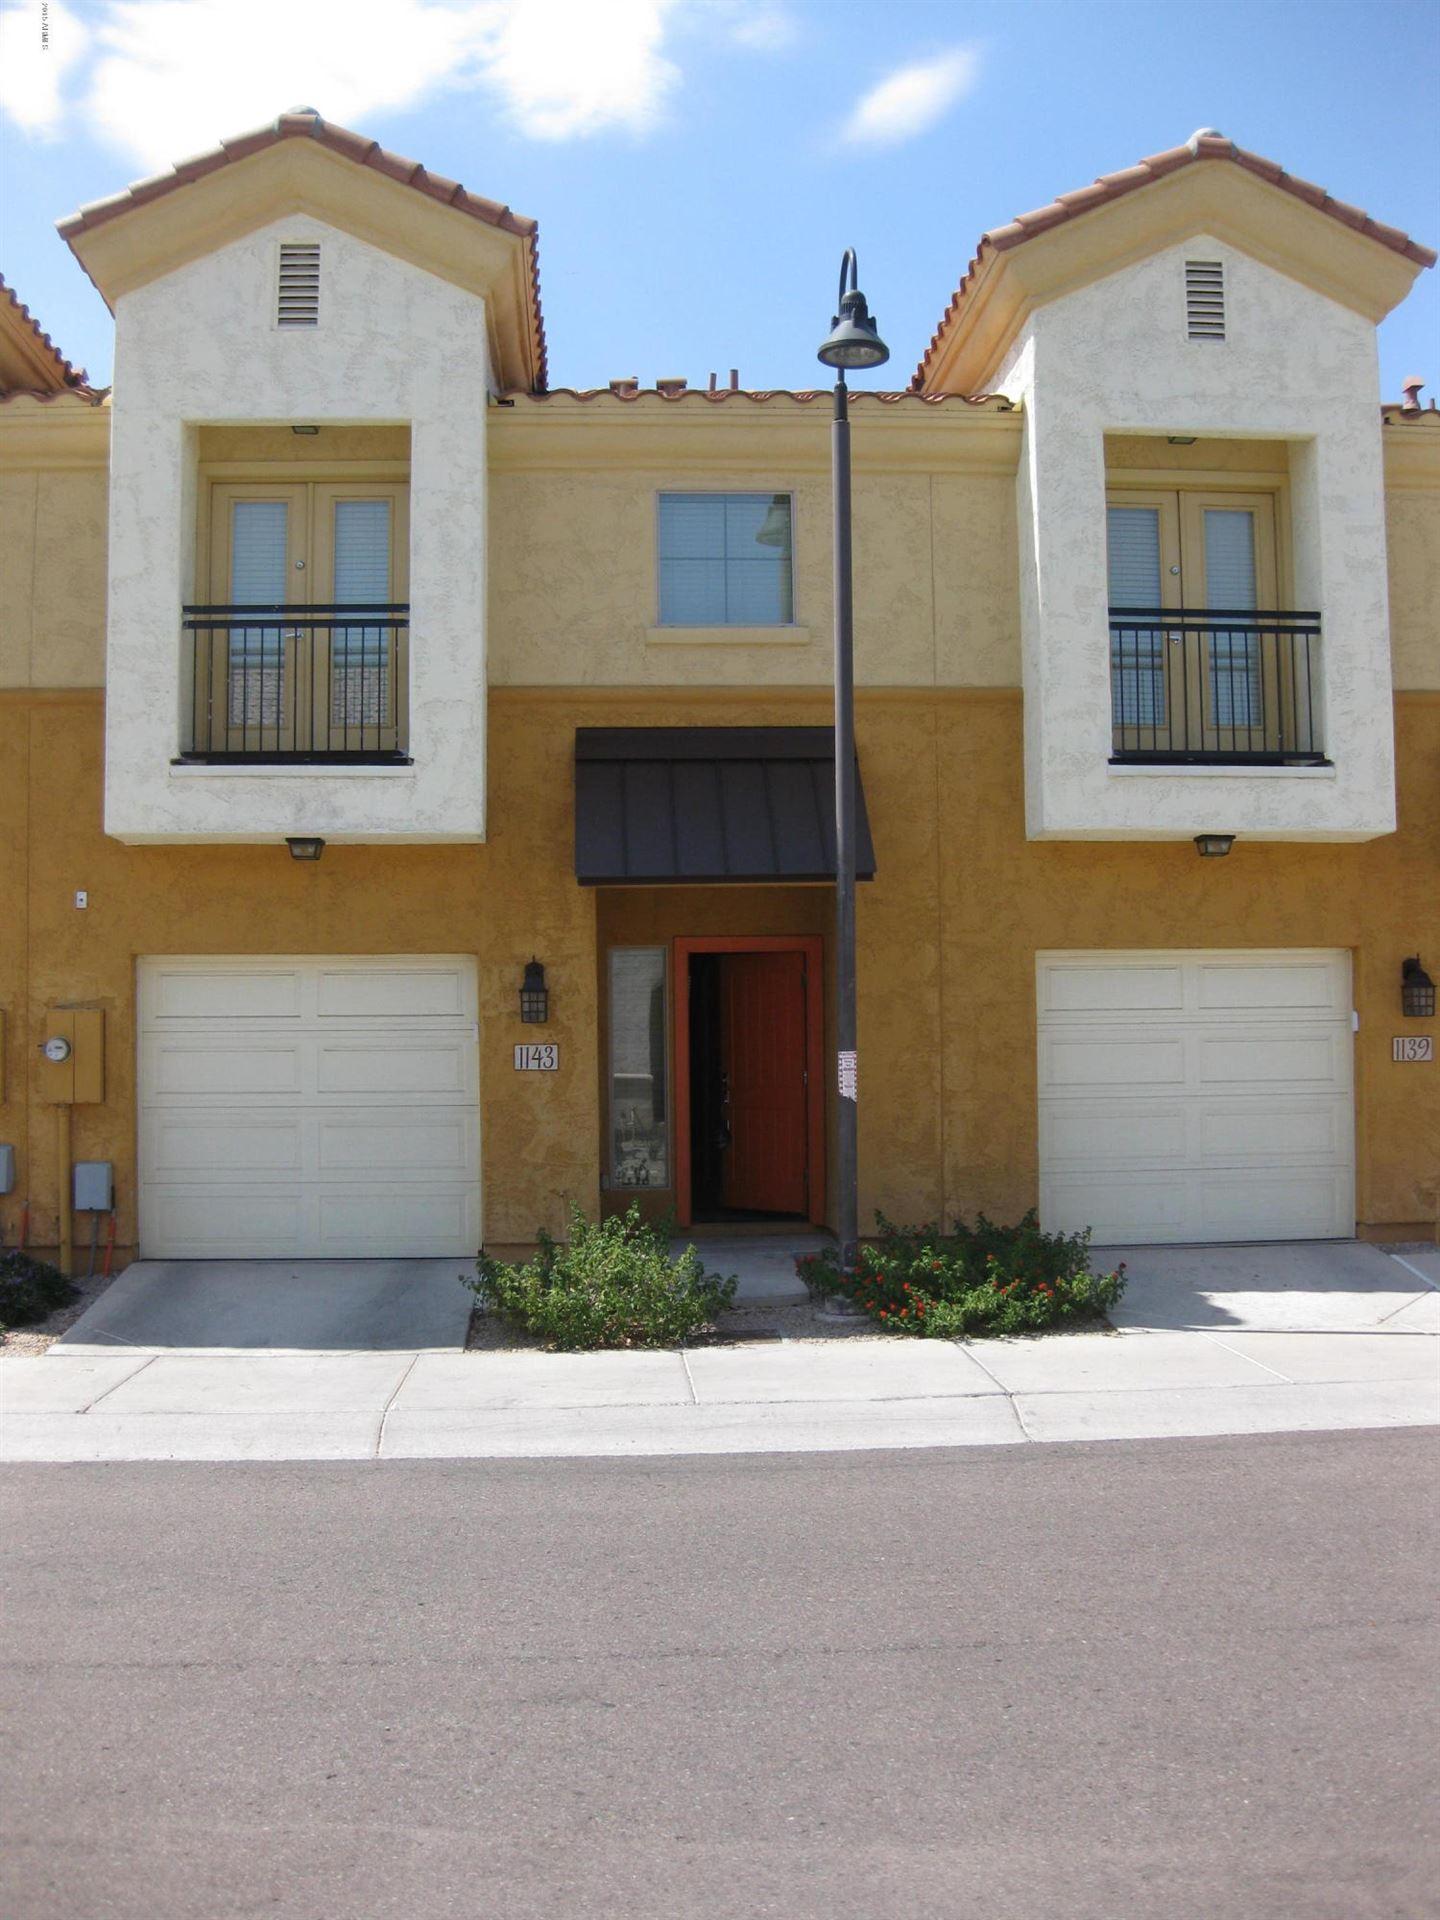 Photo of 1143 E CEDAR Street, Tempe, AZ 85281 (MLS # 6231272)